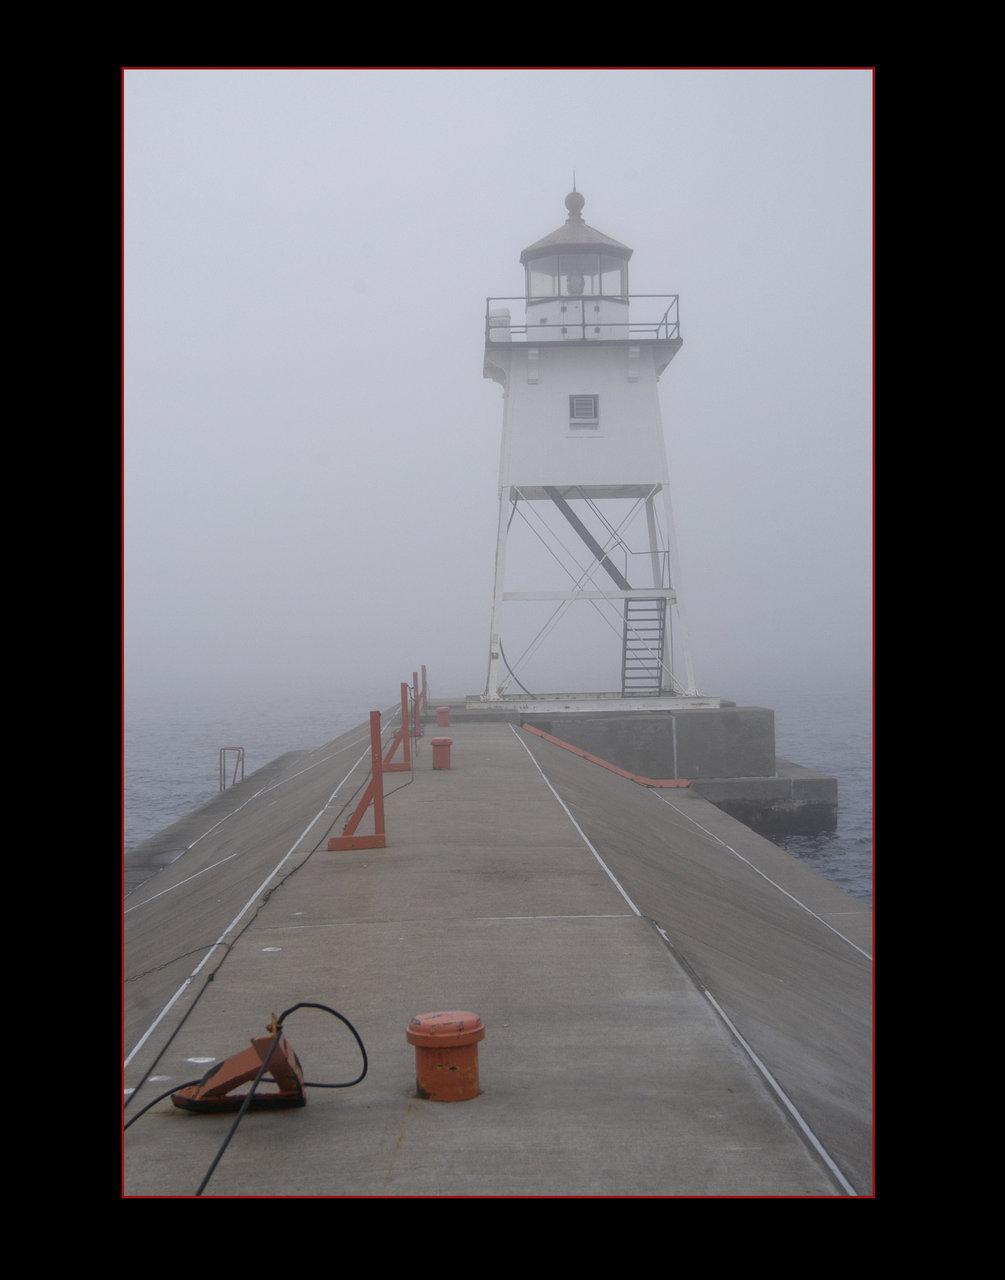 Lighthouse Scenic Photo